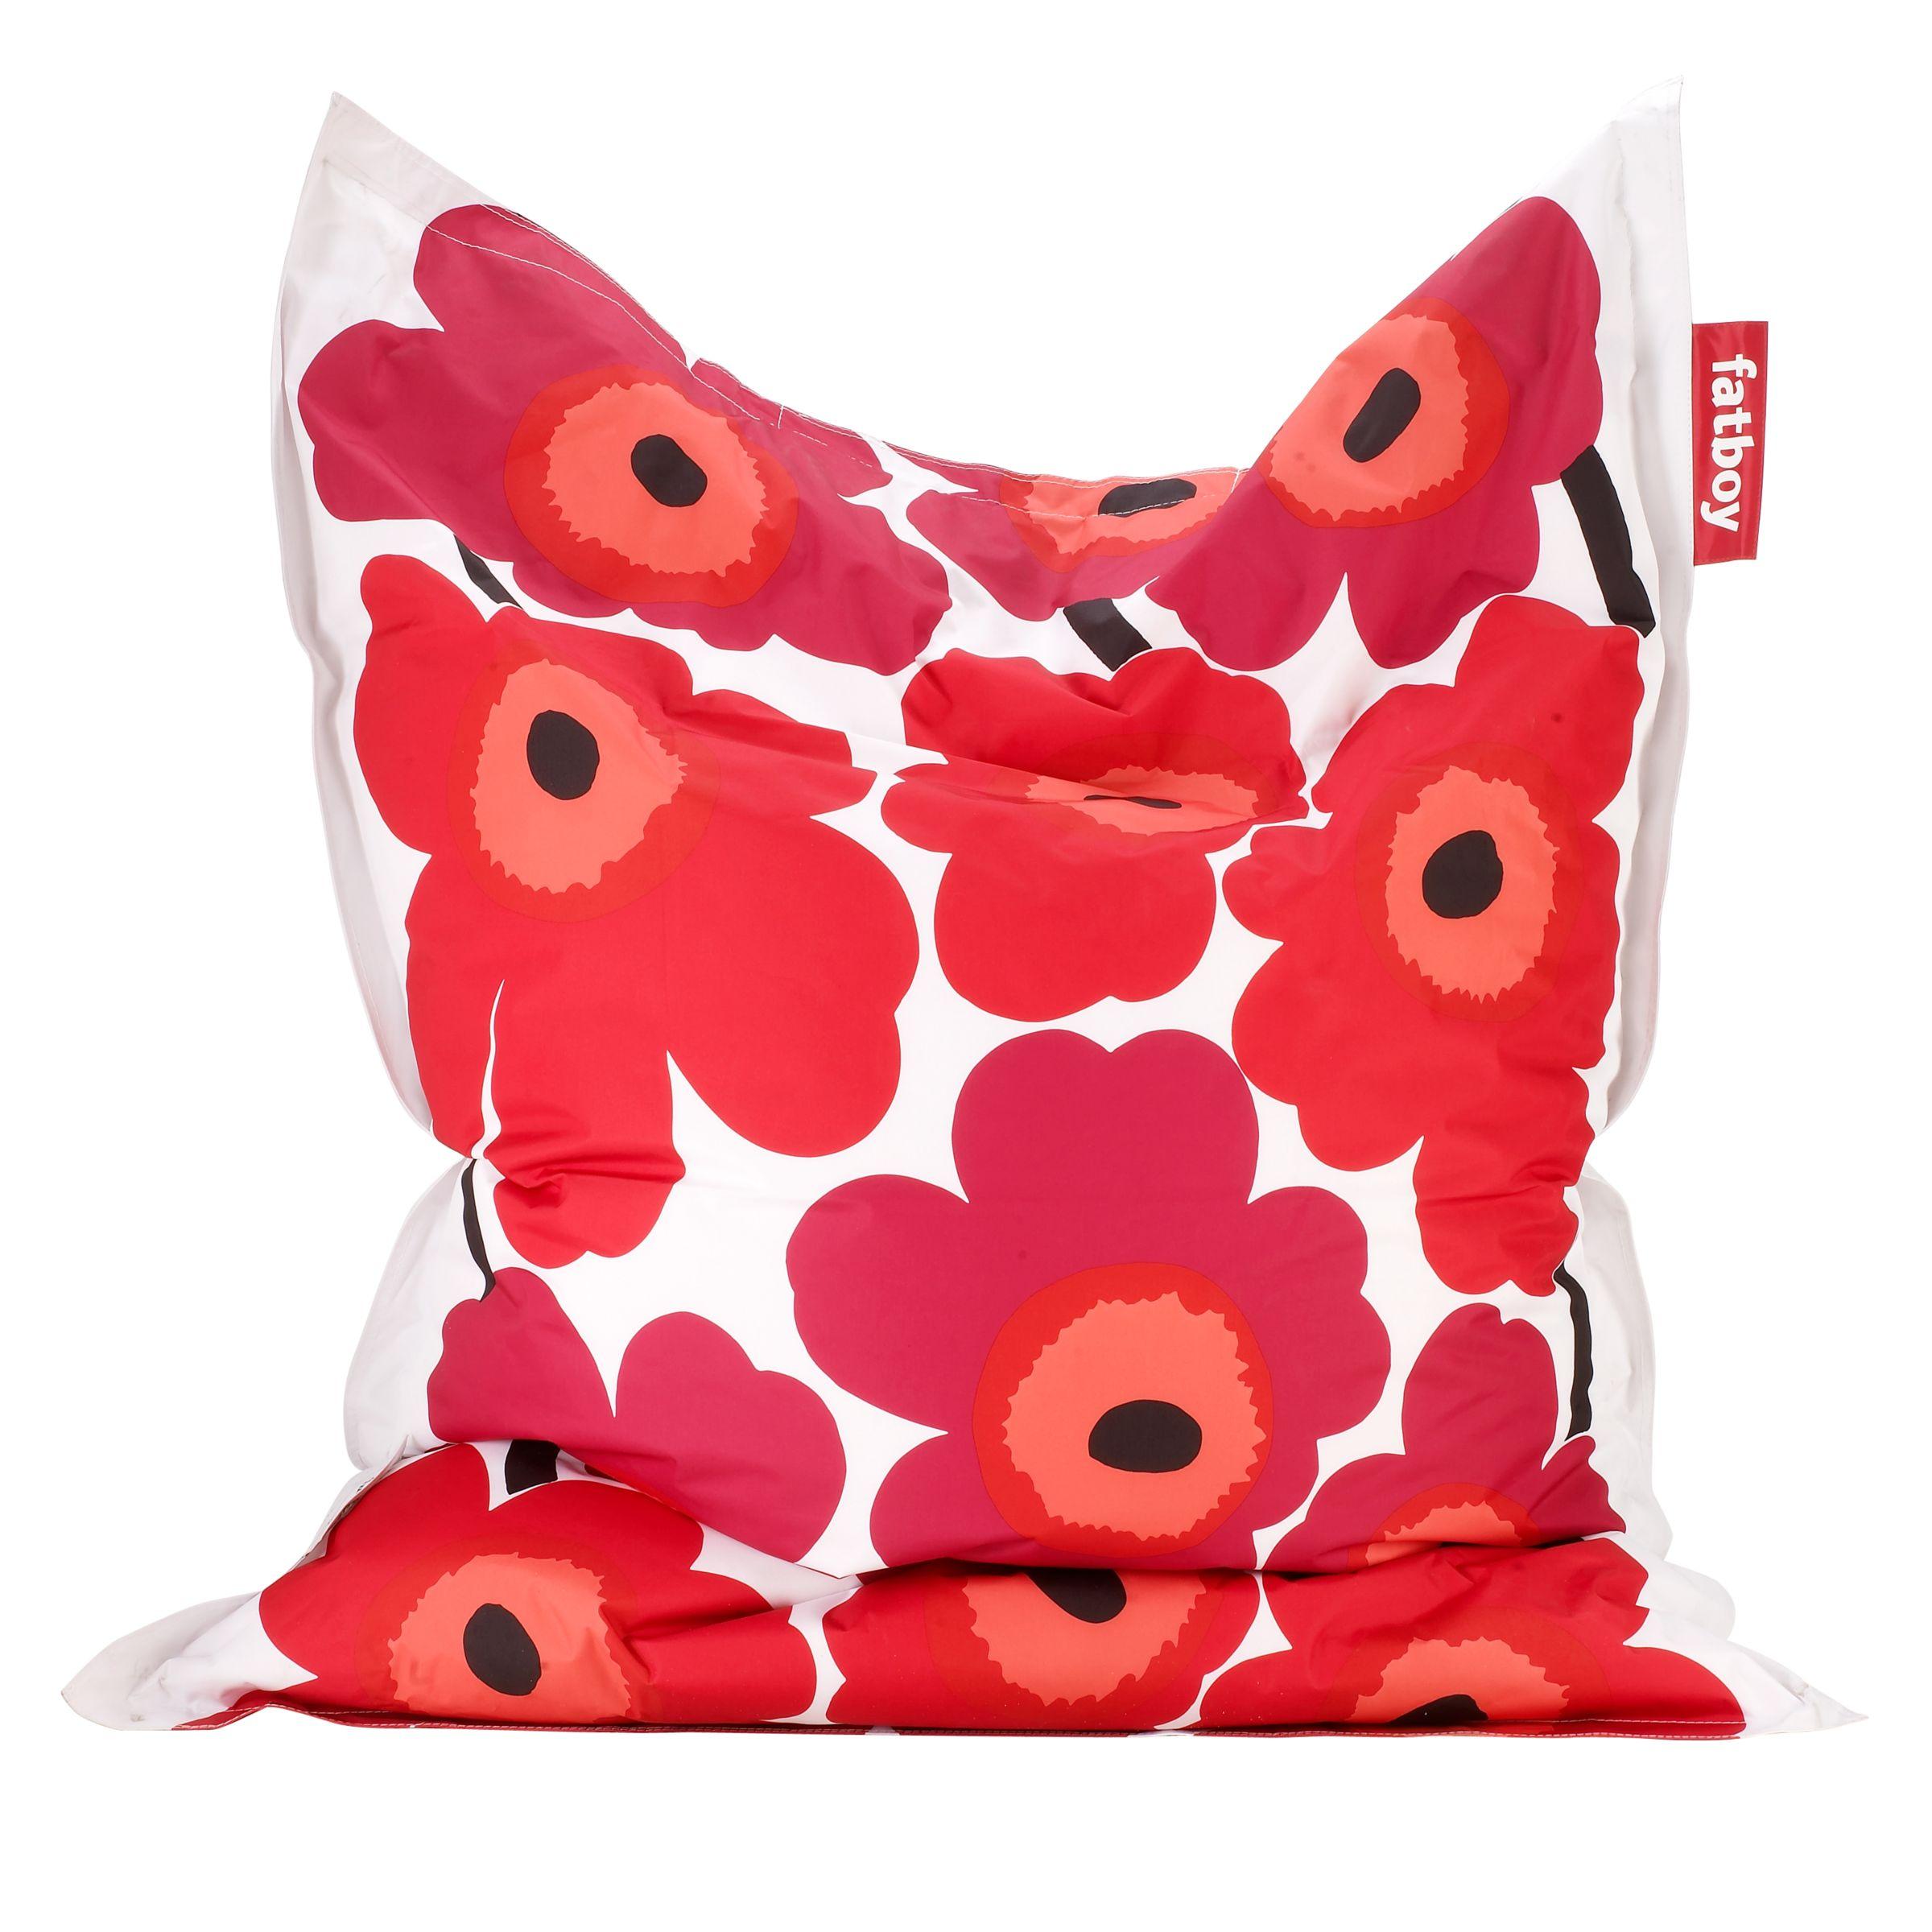 fat boys bean bags. Black Bedroom Furniture Sets. Home Design Ideas